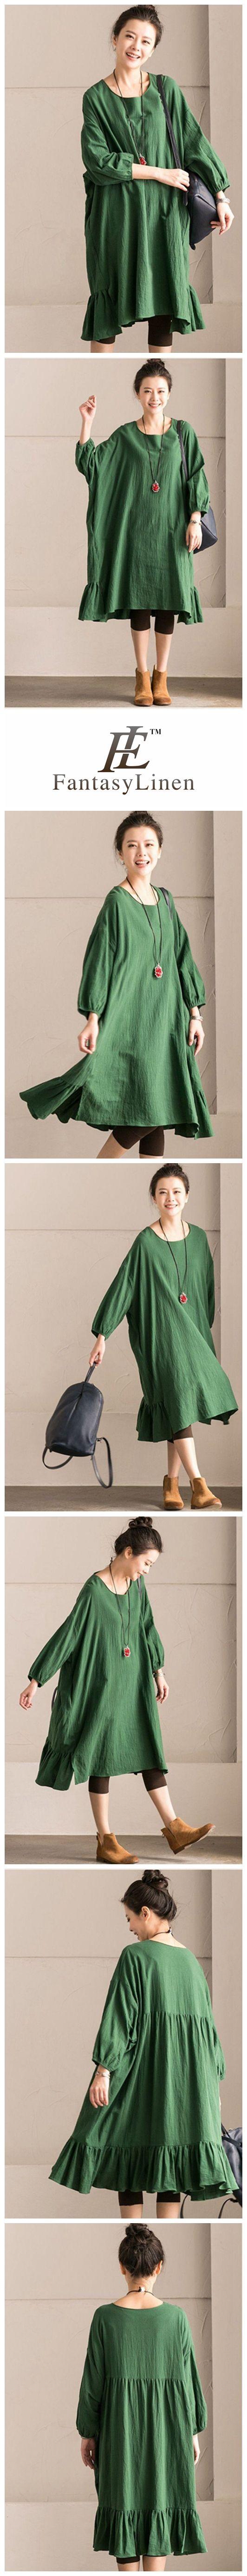 Green Korean Style Cotton Linen Falbala Bat Sleeve Round Neck Loose Women Clothes Q8300B Q8300BGreen